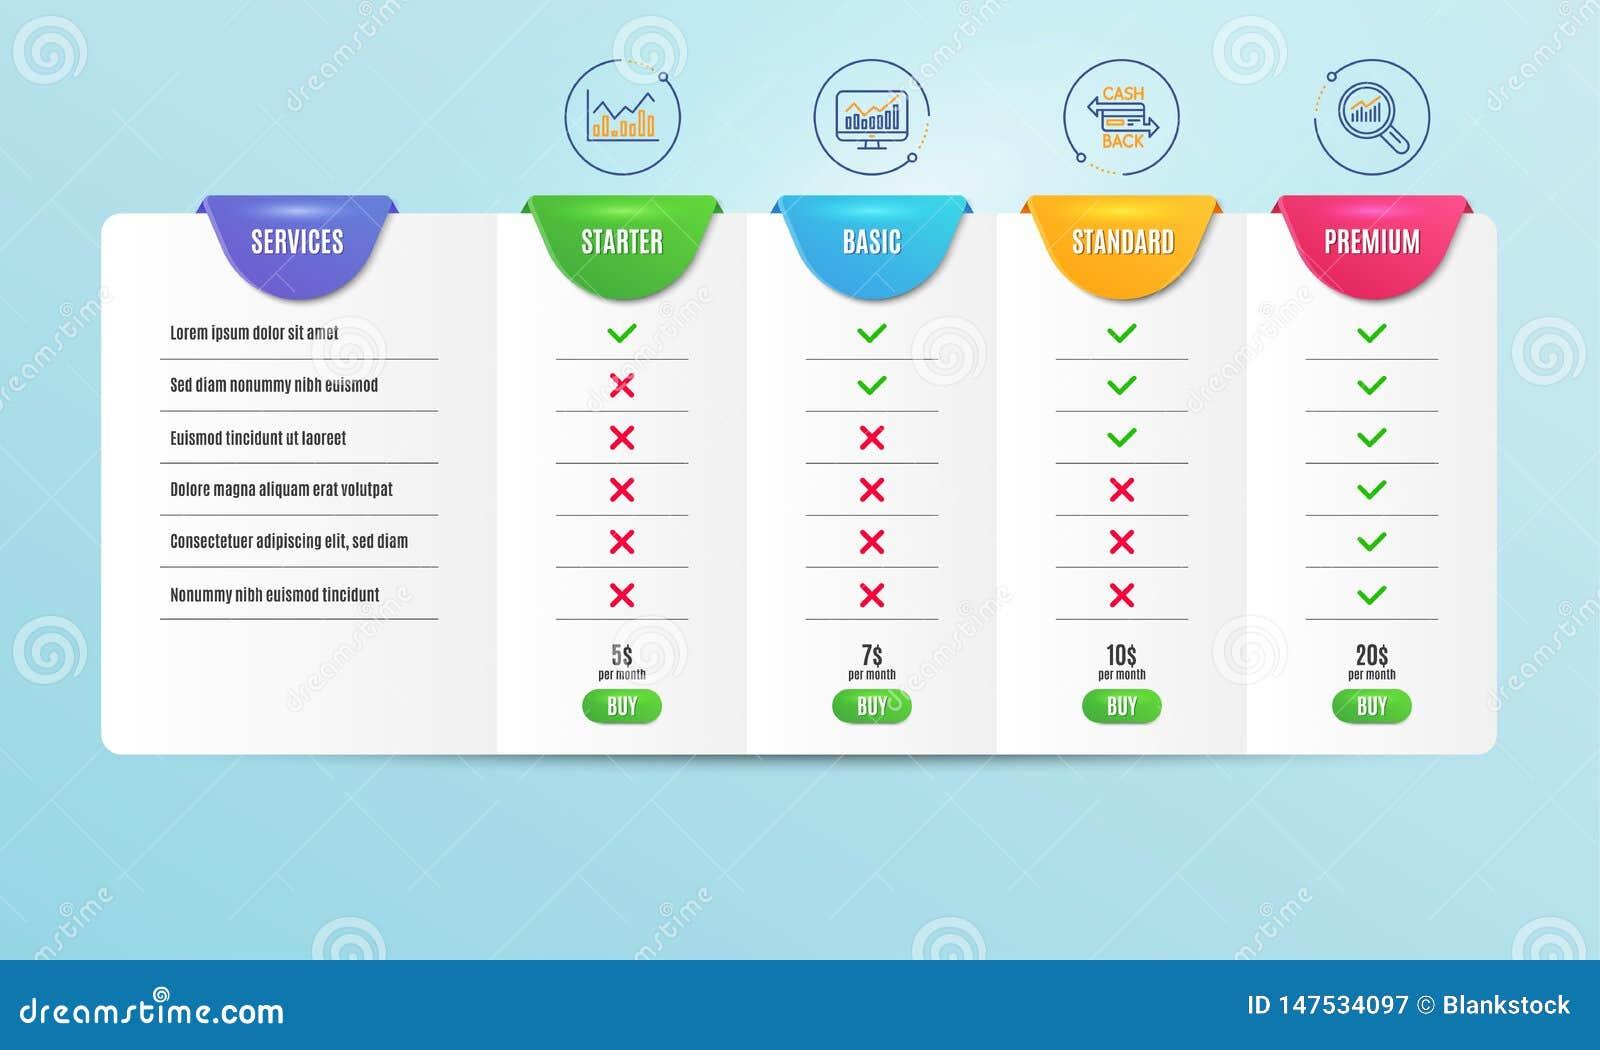 Infochart, Cashback Card And Statistics Icons Set. Data Analysis